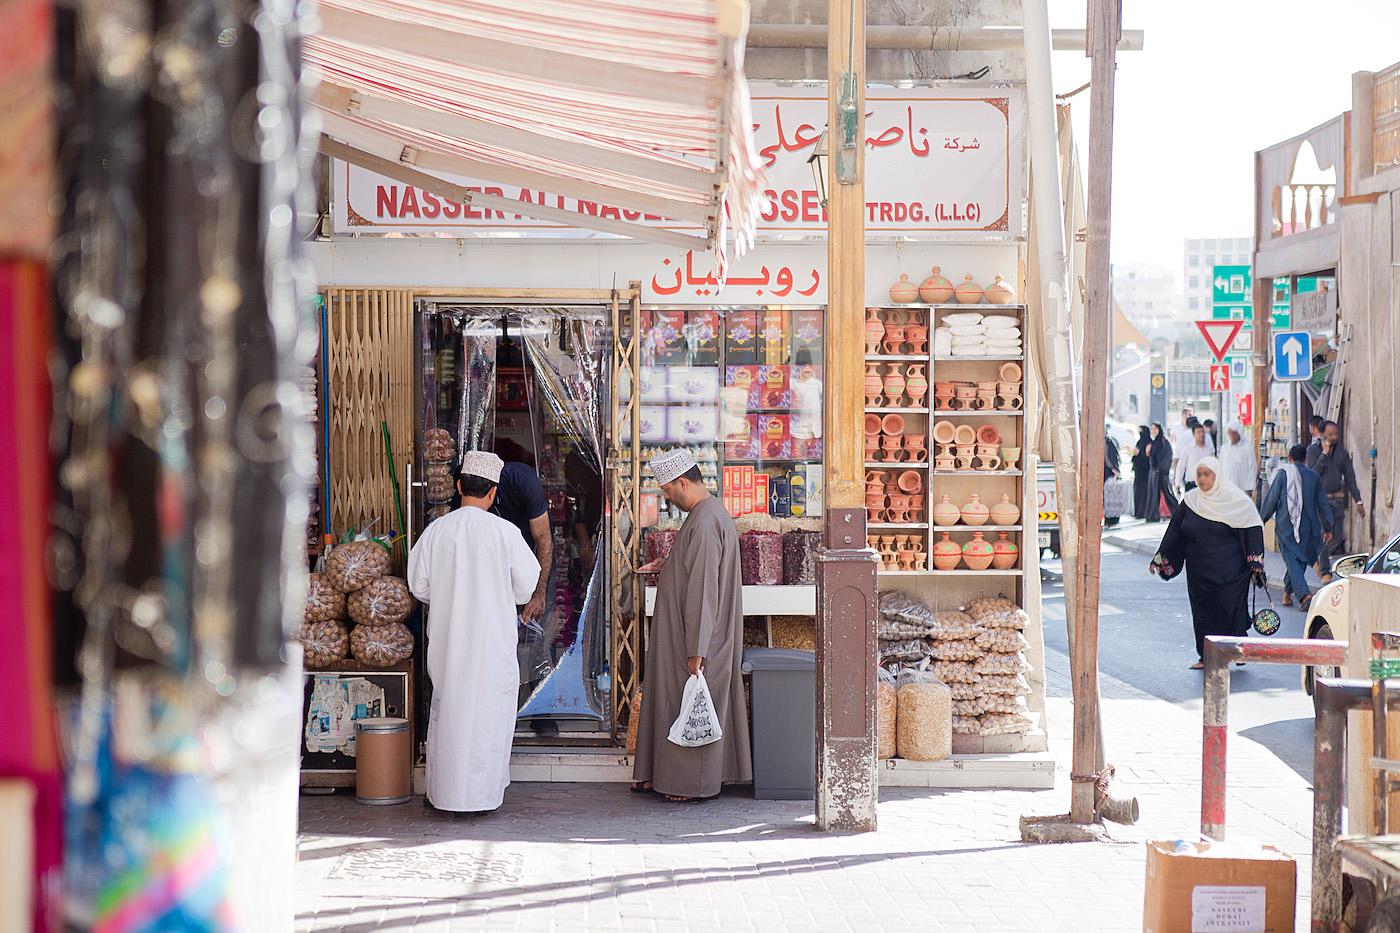 Spice Bazaar Dubai _ Spice Souk Dubai _ visit dubai _ what to see in dubai _ Bur Dubai _ Old Dubai _ Old Town Dubai _ Souks Dubai